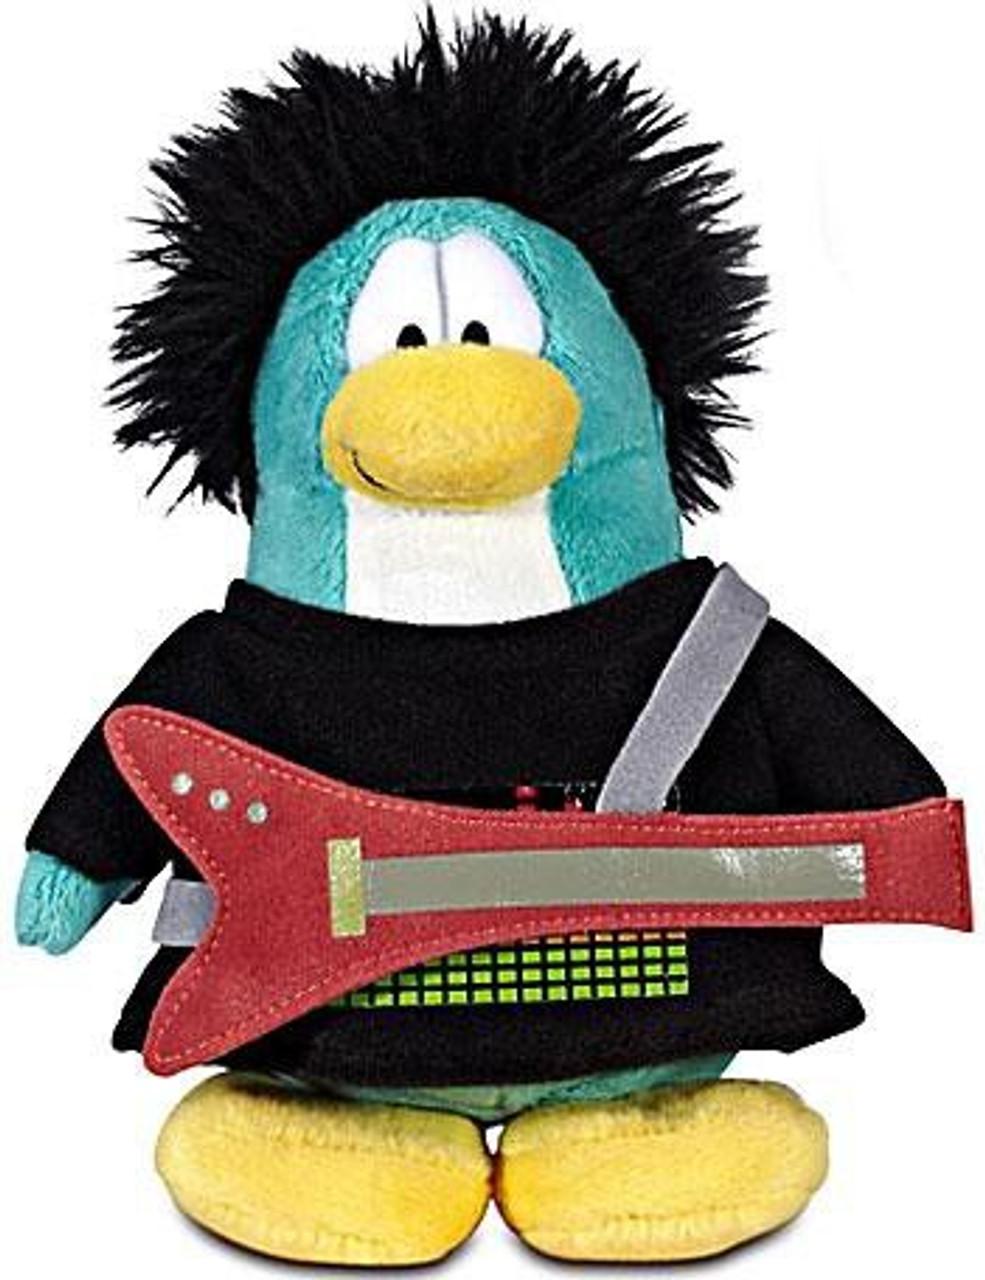 Club Penguin Series 12 New Rocker 6.5-Inch Plush Figure